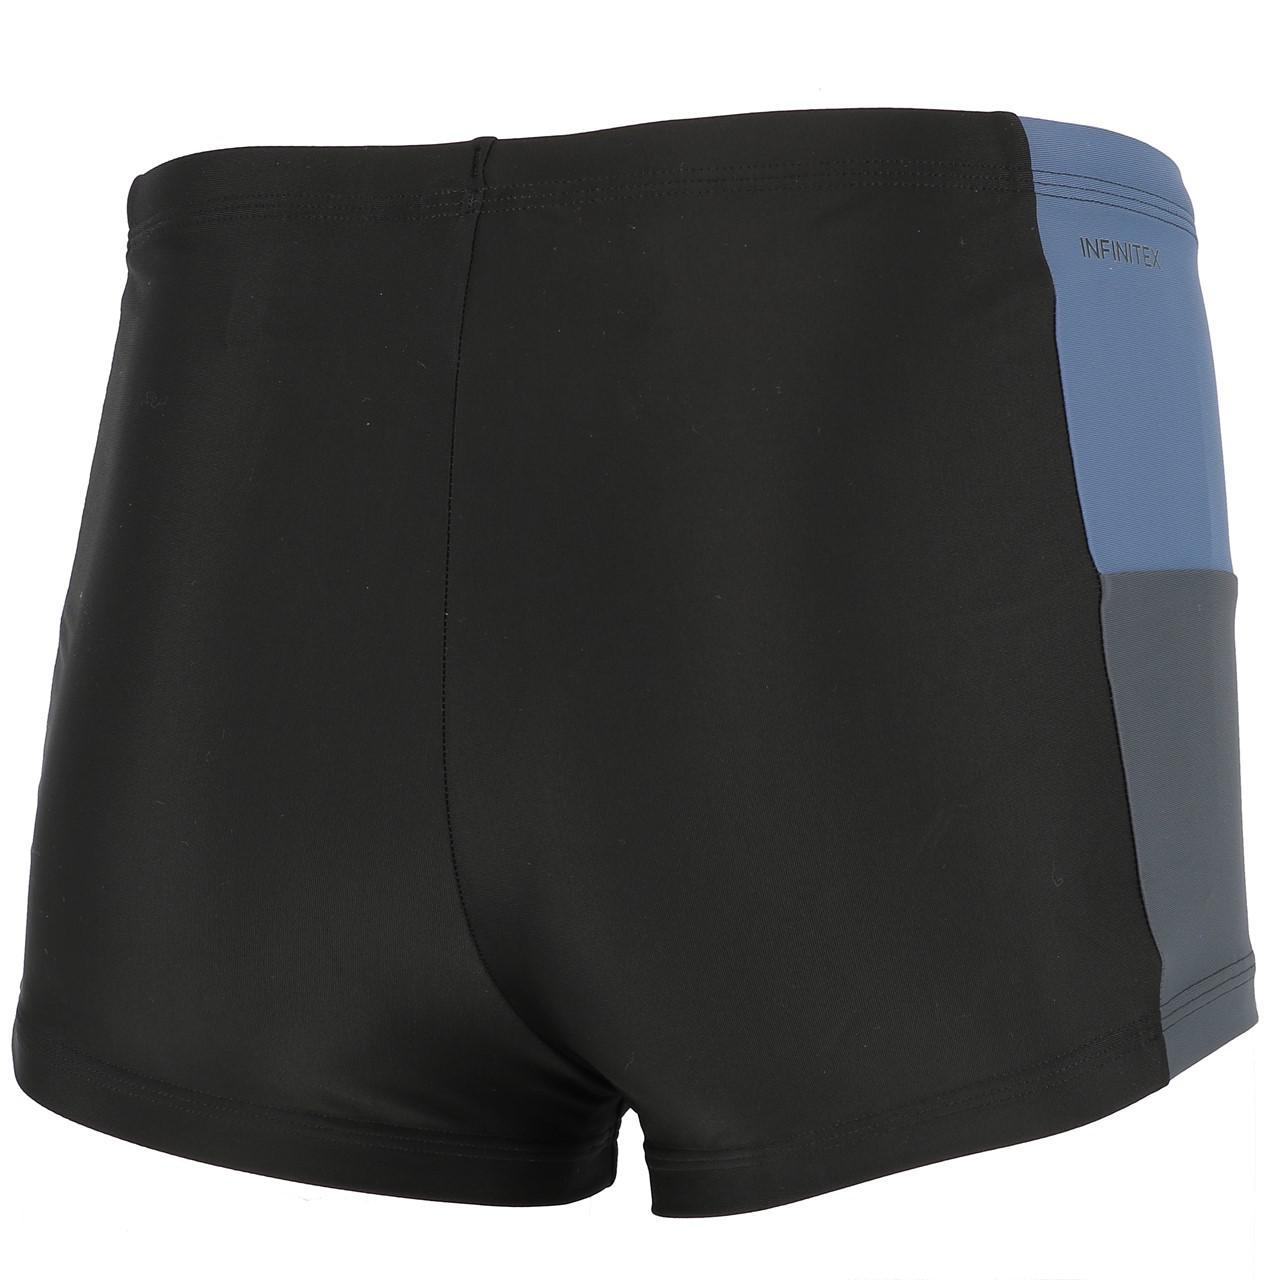 Boxer-Swimsuit-Adidas-Inf-CB-Bx-Black-Black-19080-New thumbnail 5